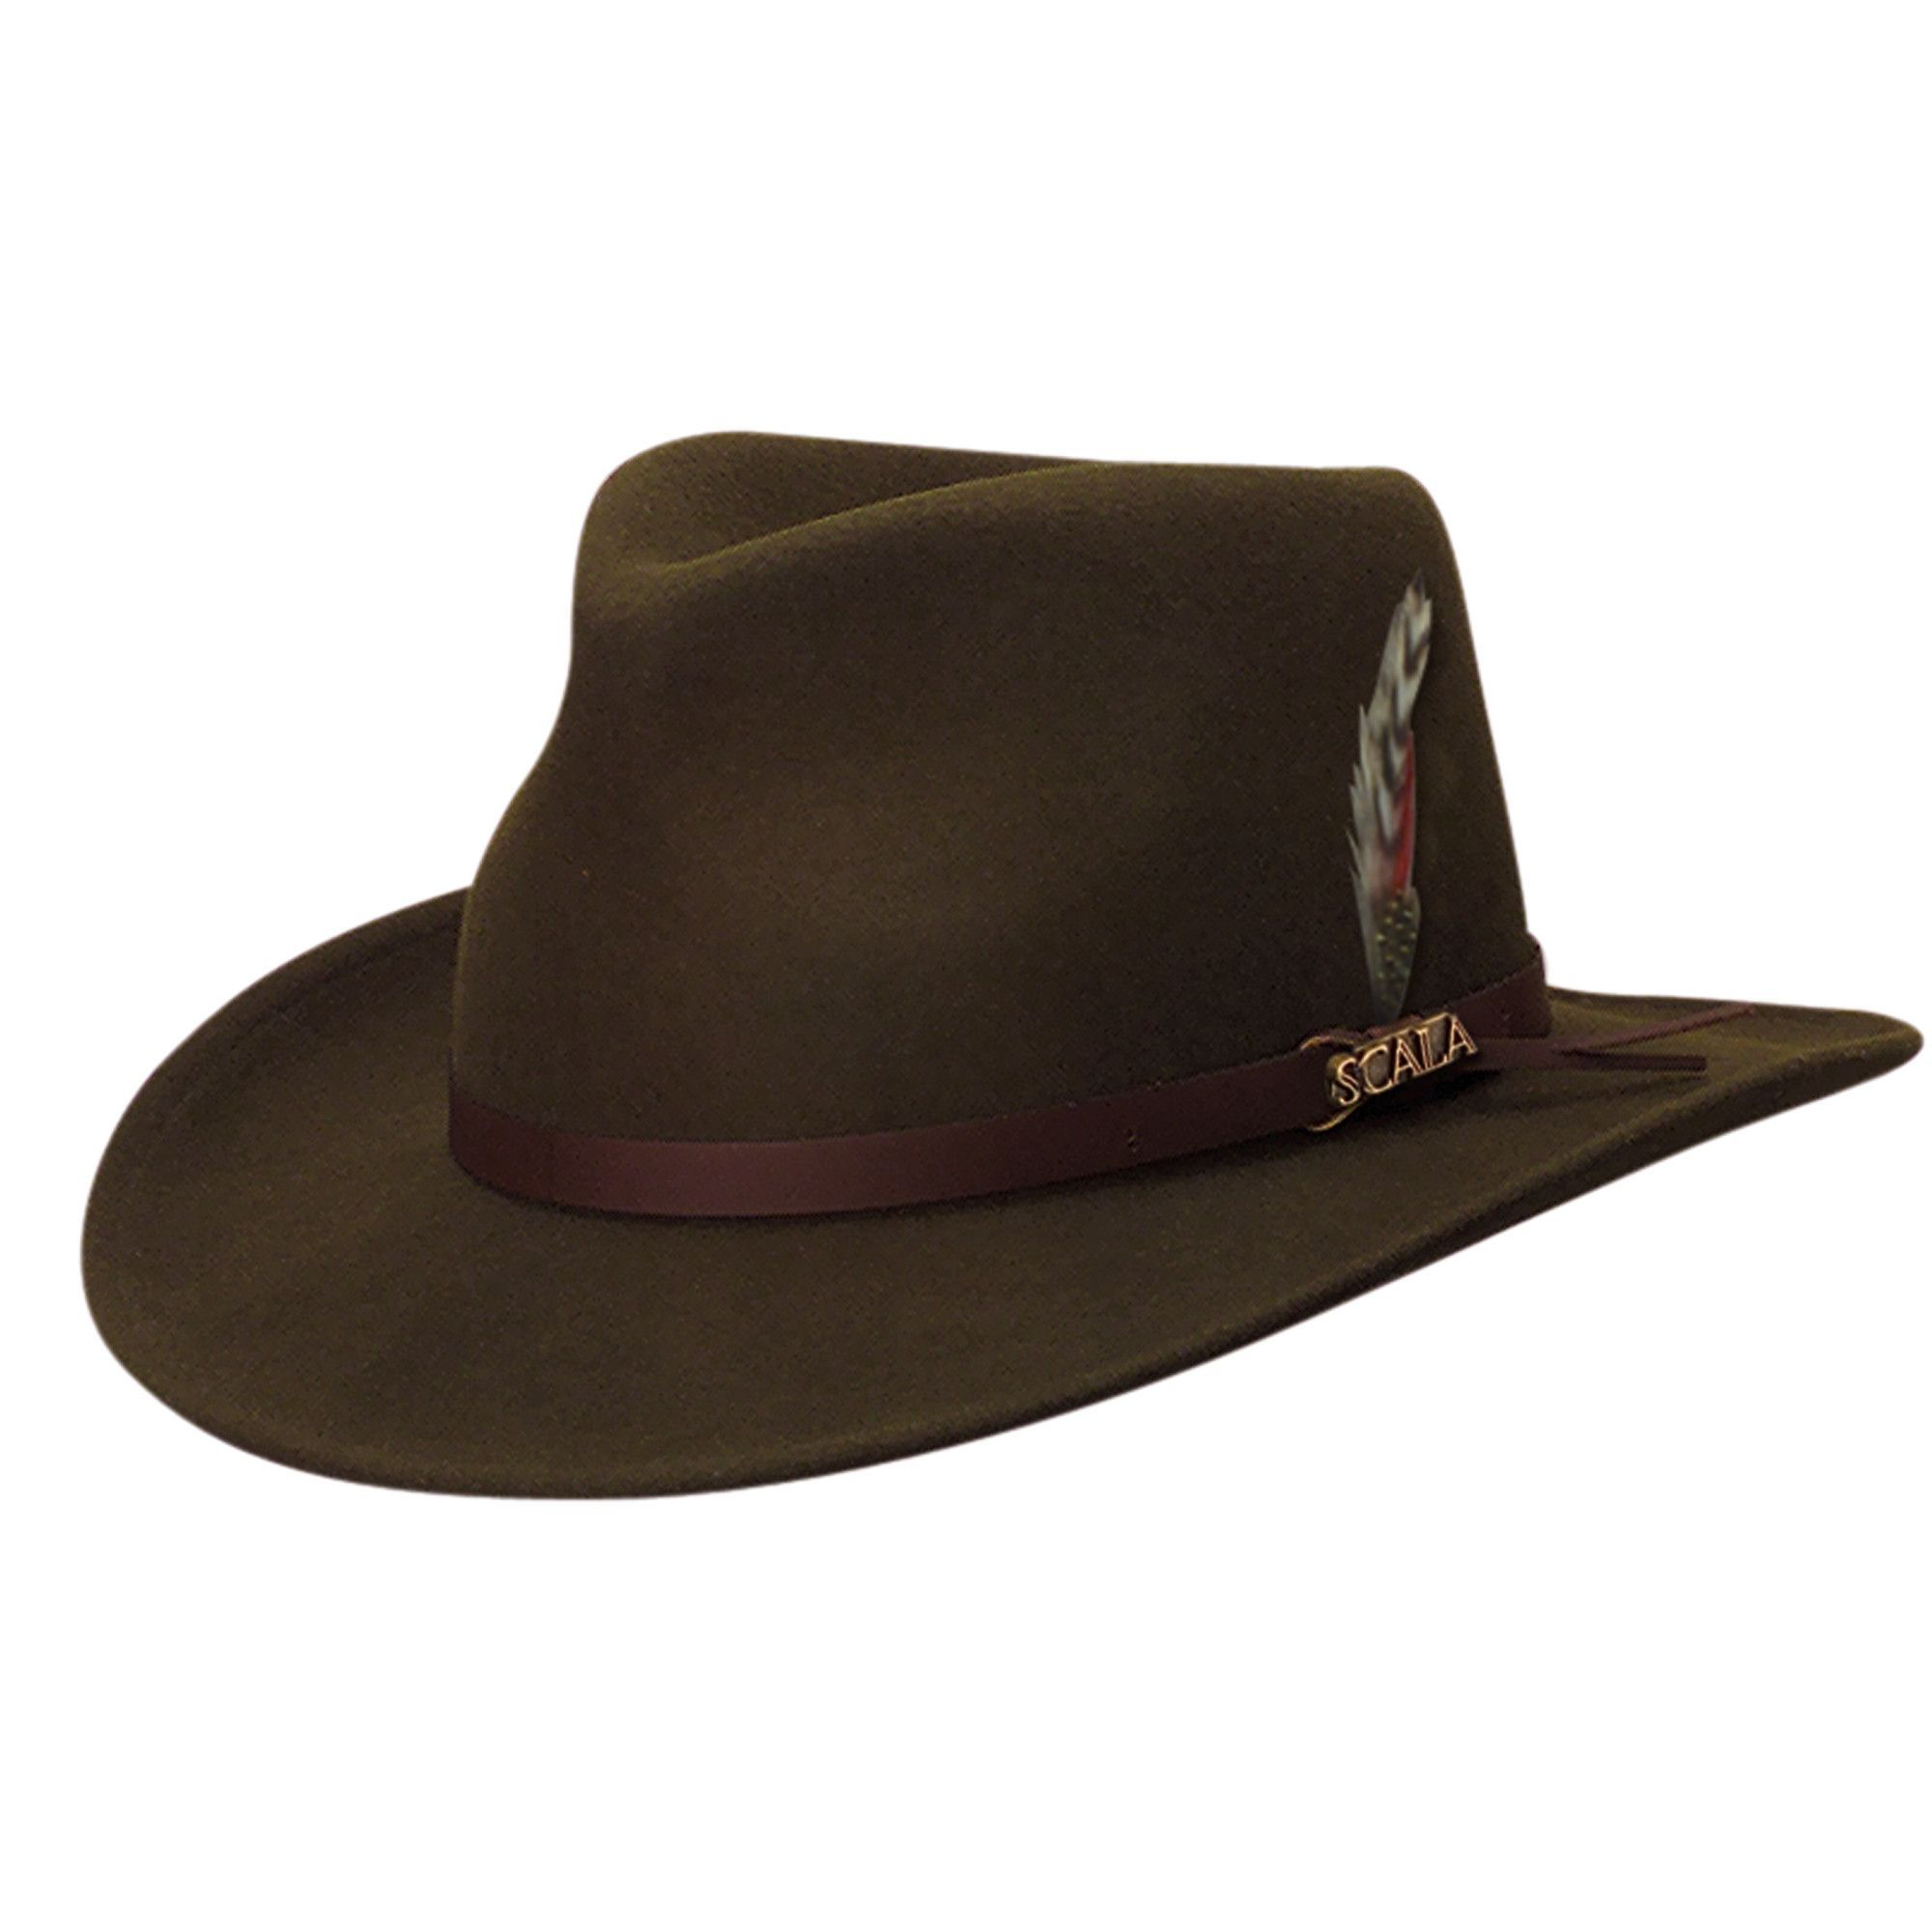 a733b869ba3aa Scala Men s Wool Felt Water Repellent Crushable Fedora Hat